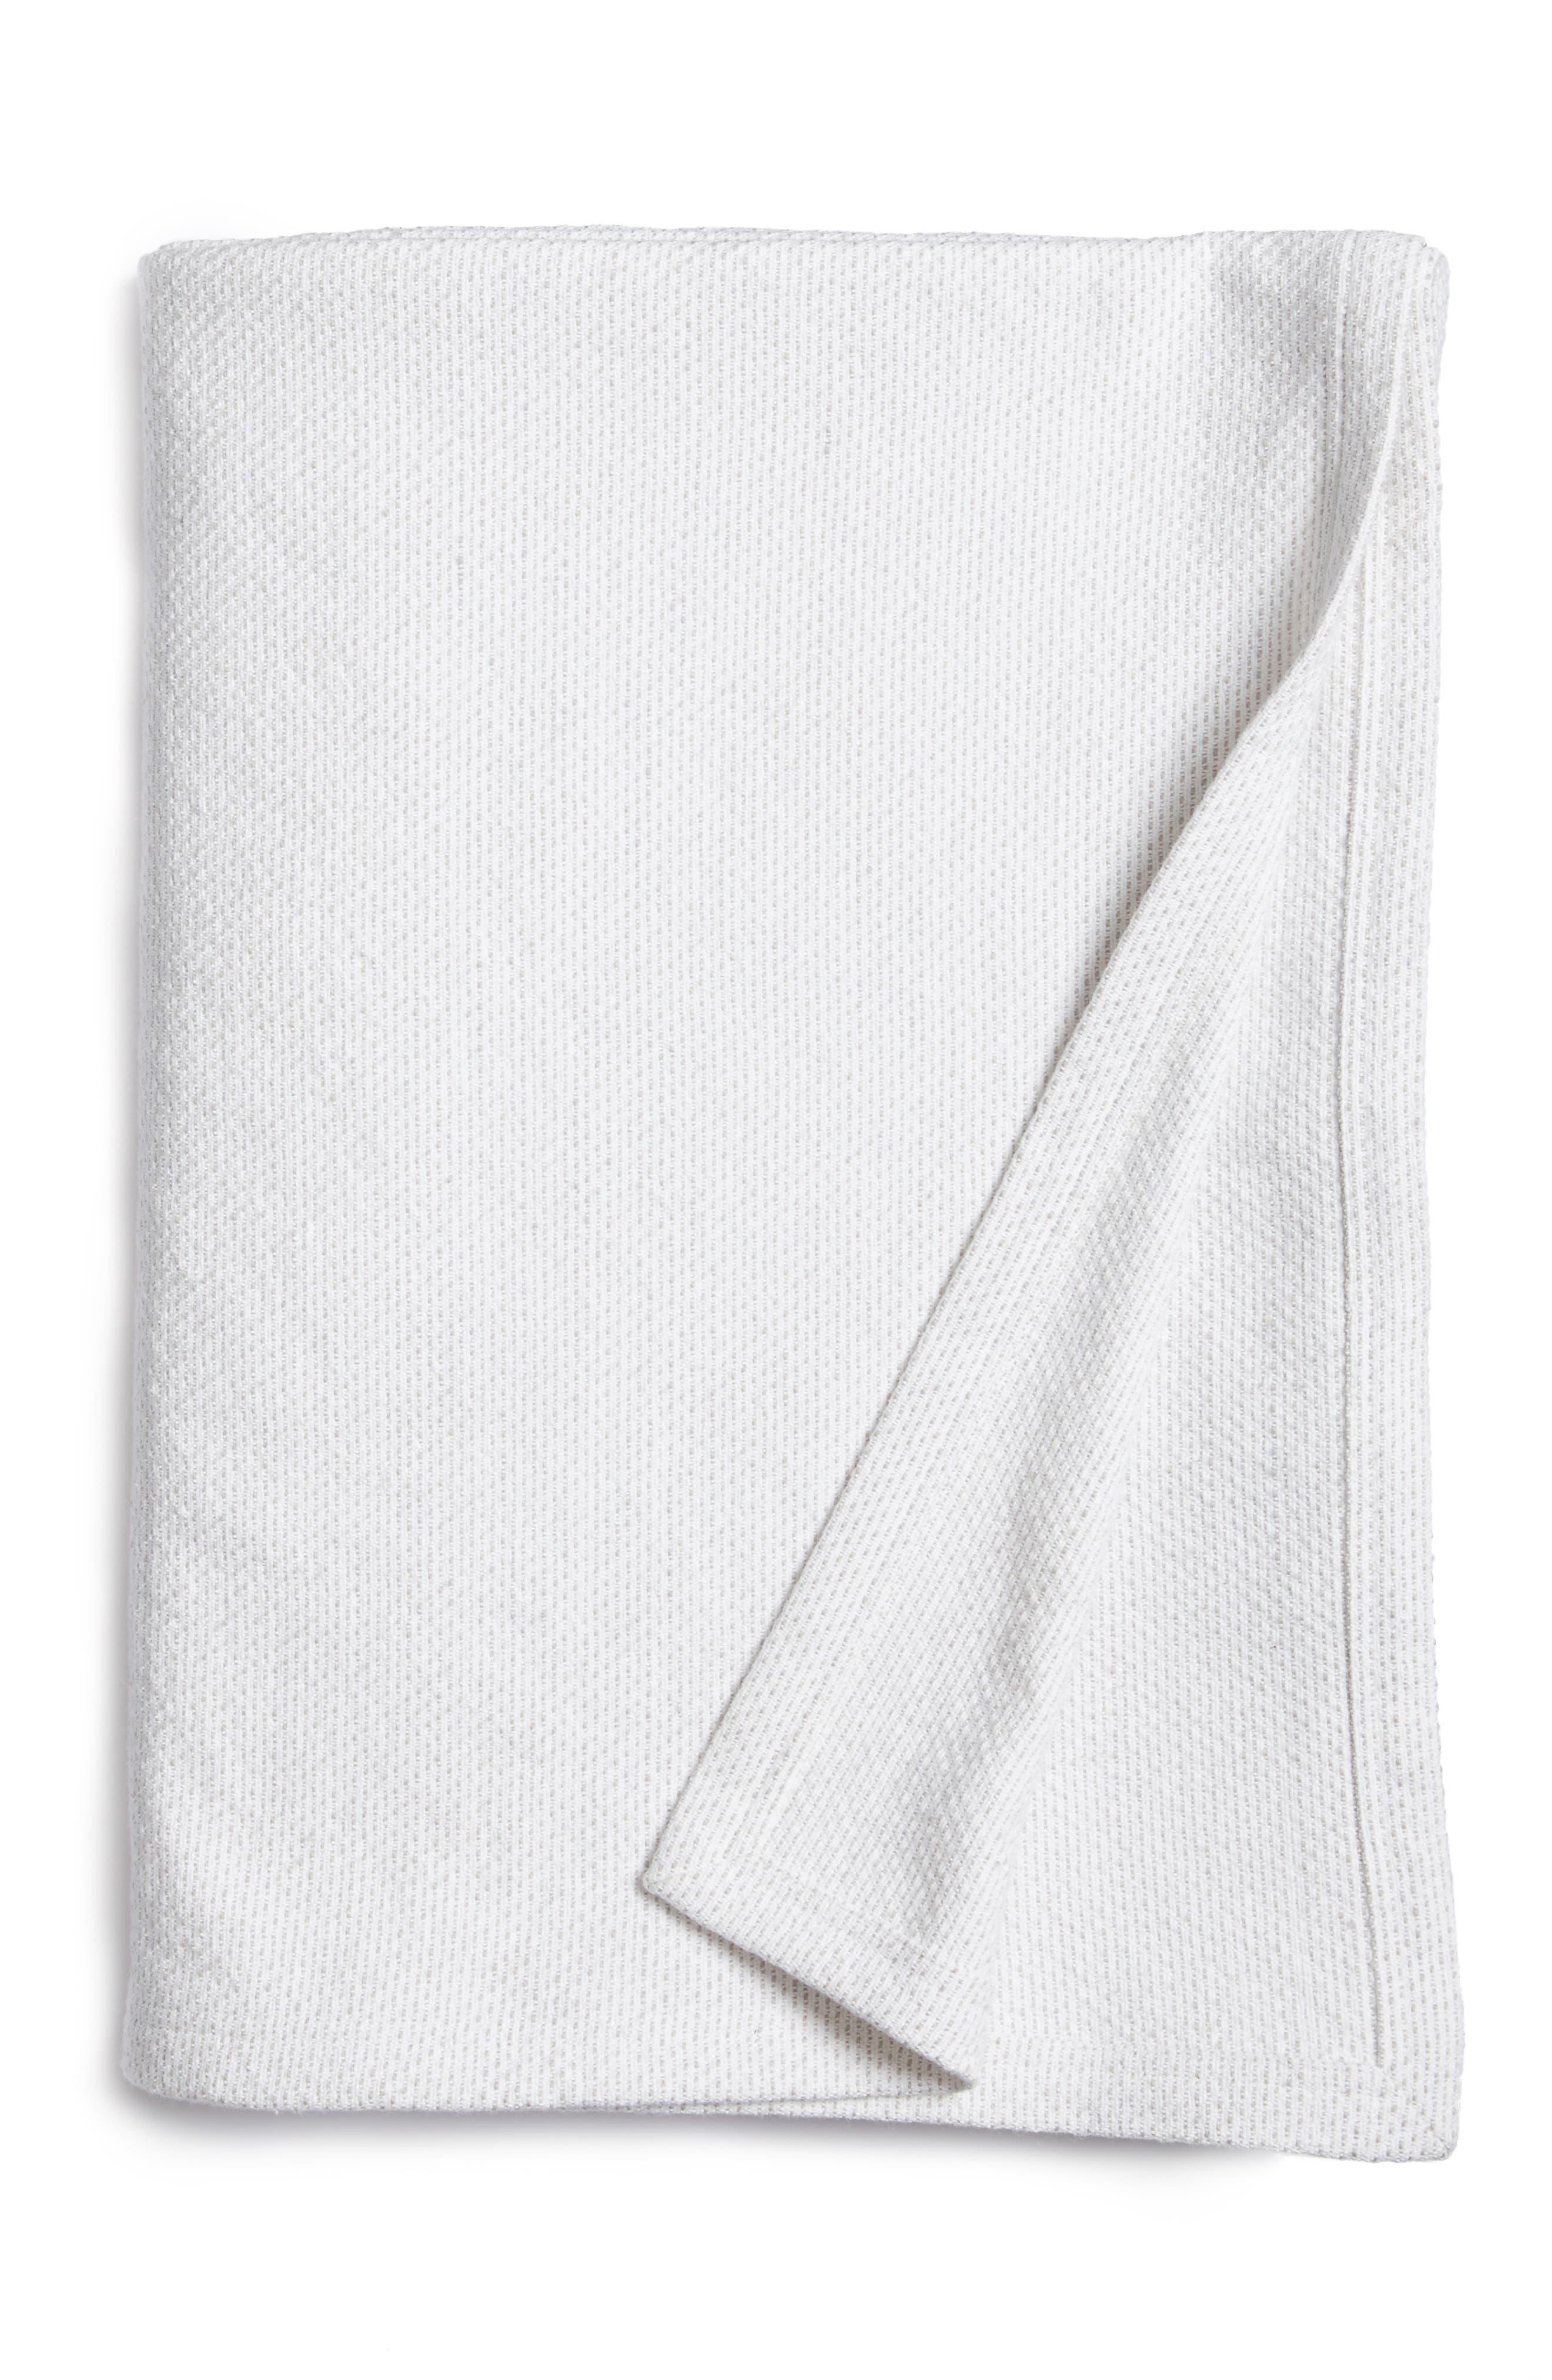 Alternate Image 1 Selected - Calvin Klein Arctic Blanket